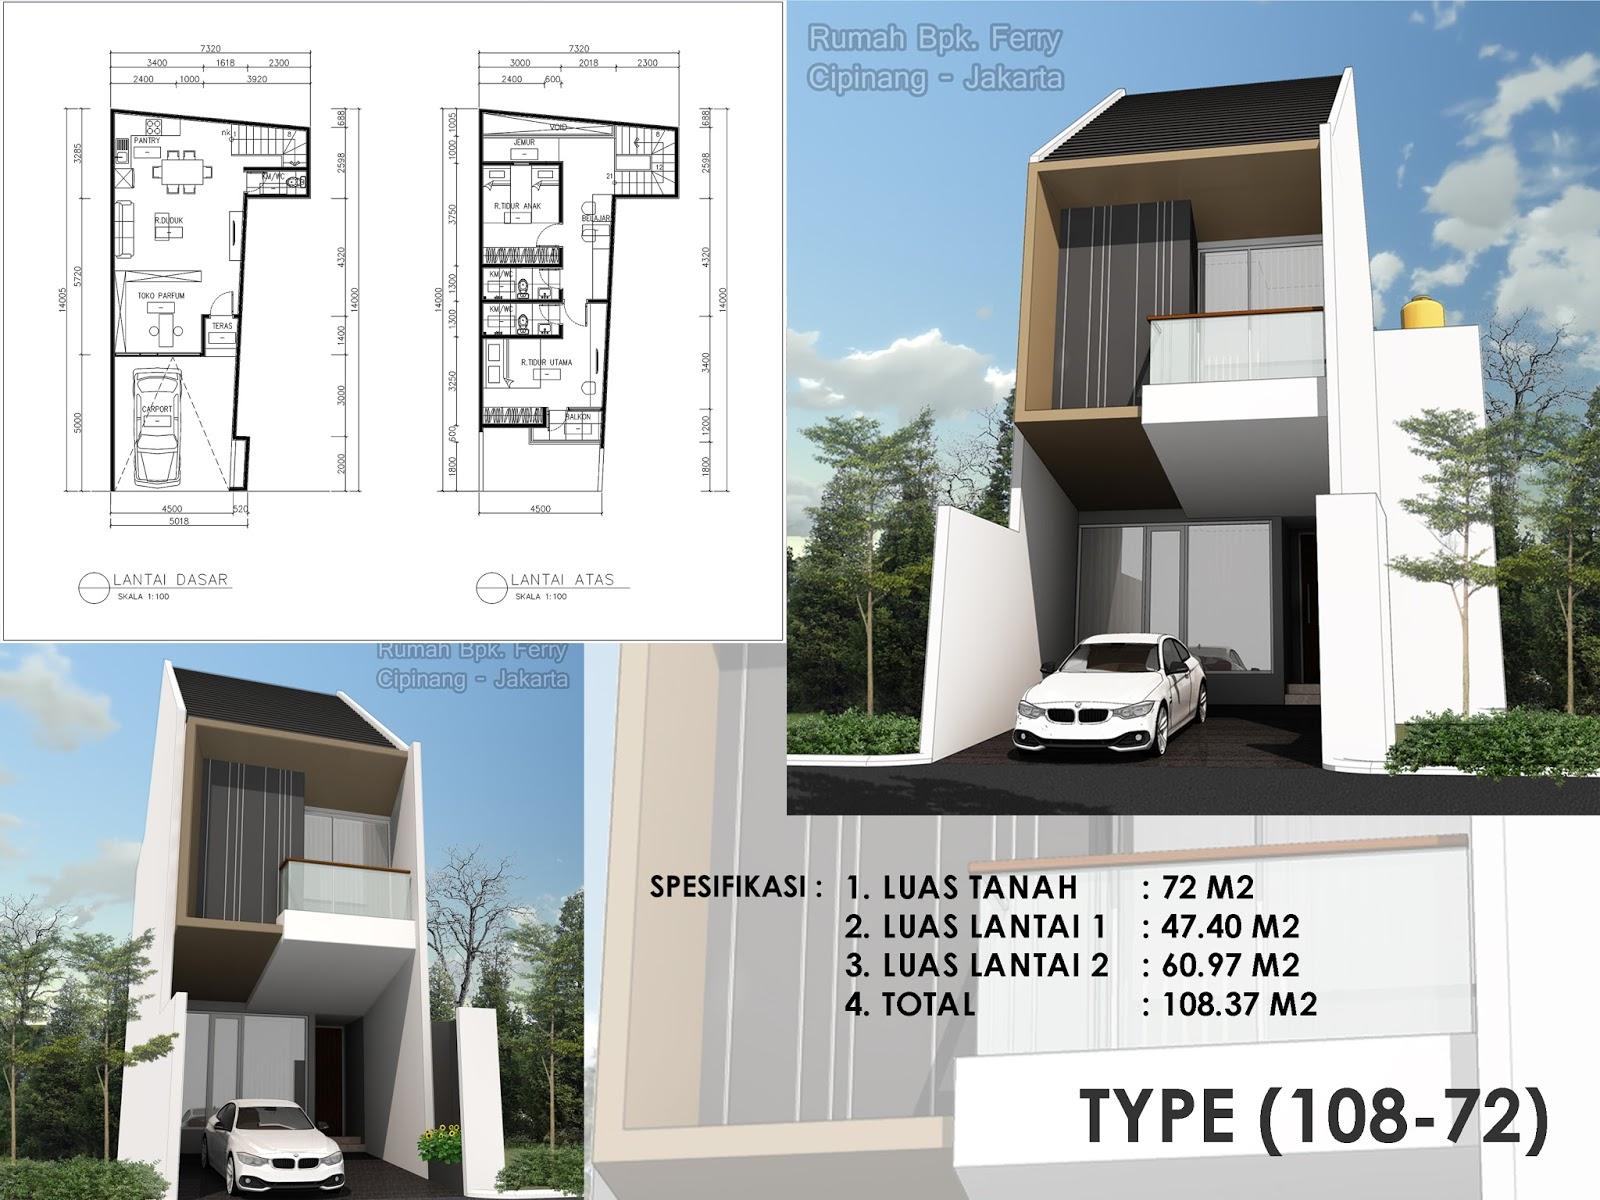 Desain Rumah Minimalis 2 Lantai Luas Tanah 60 M2